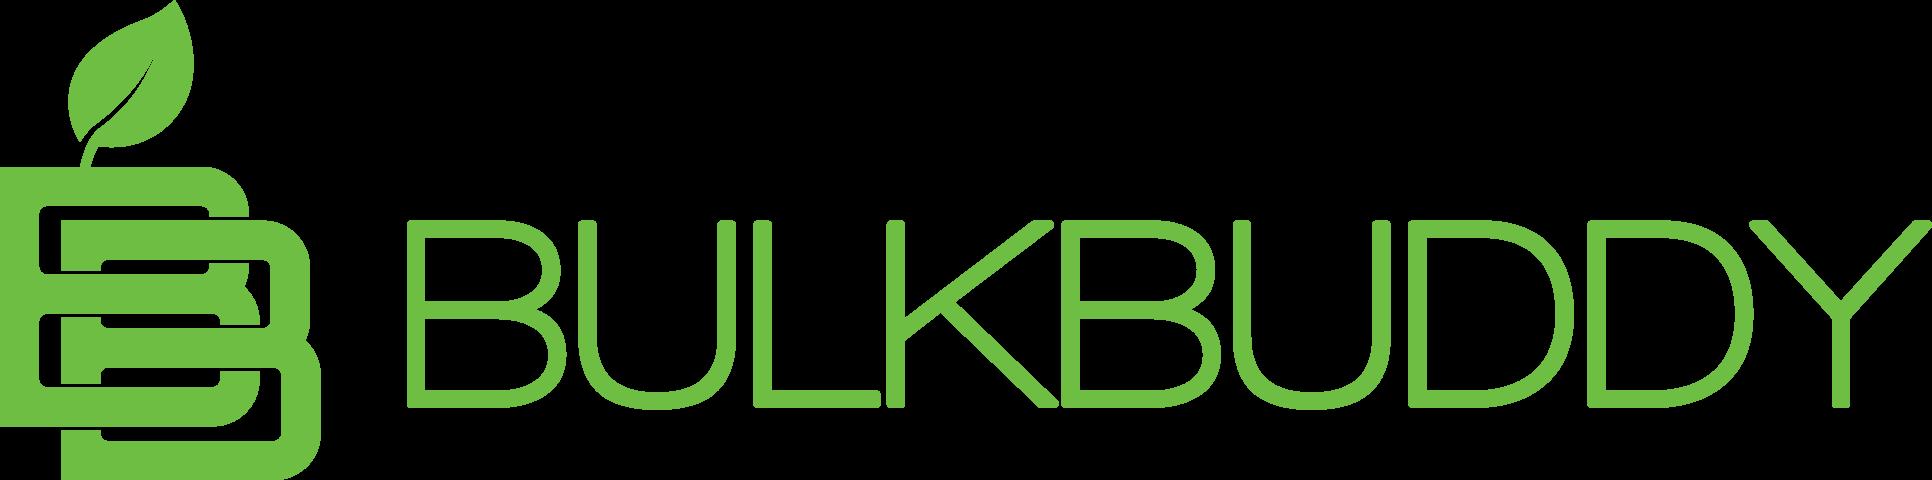 Bulk Buddy Online Dispensary (Buy Weed Online)